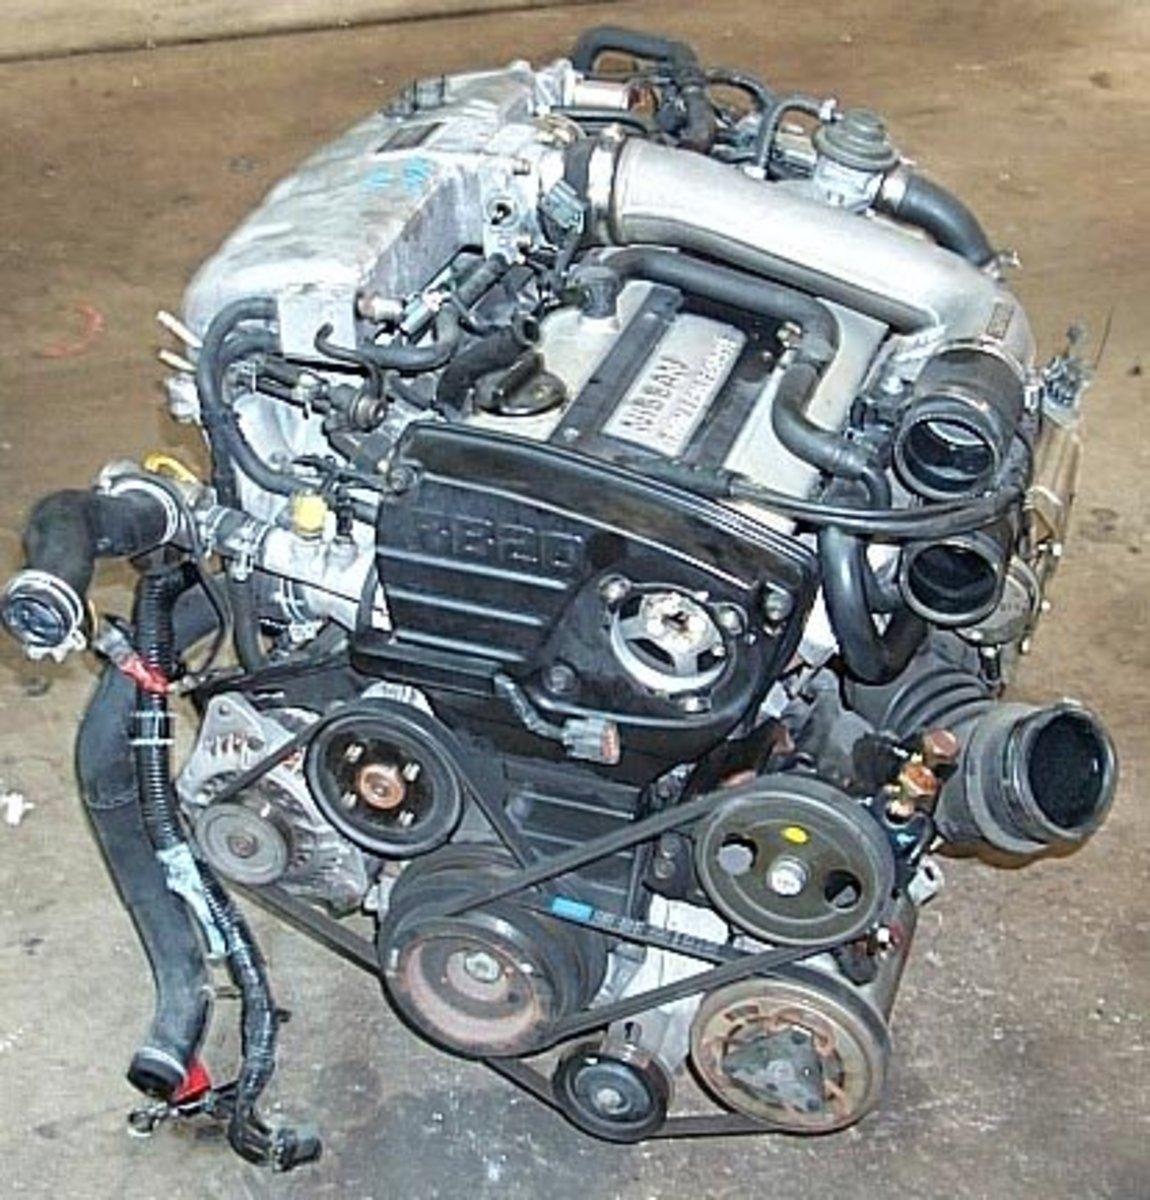 RB20 Turbo Upgrades